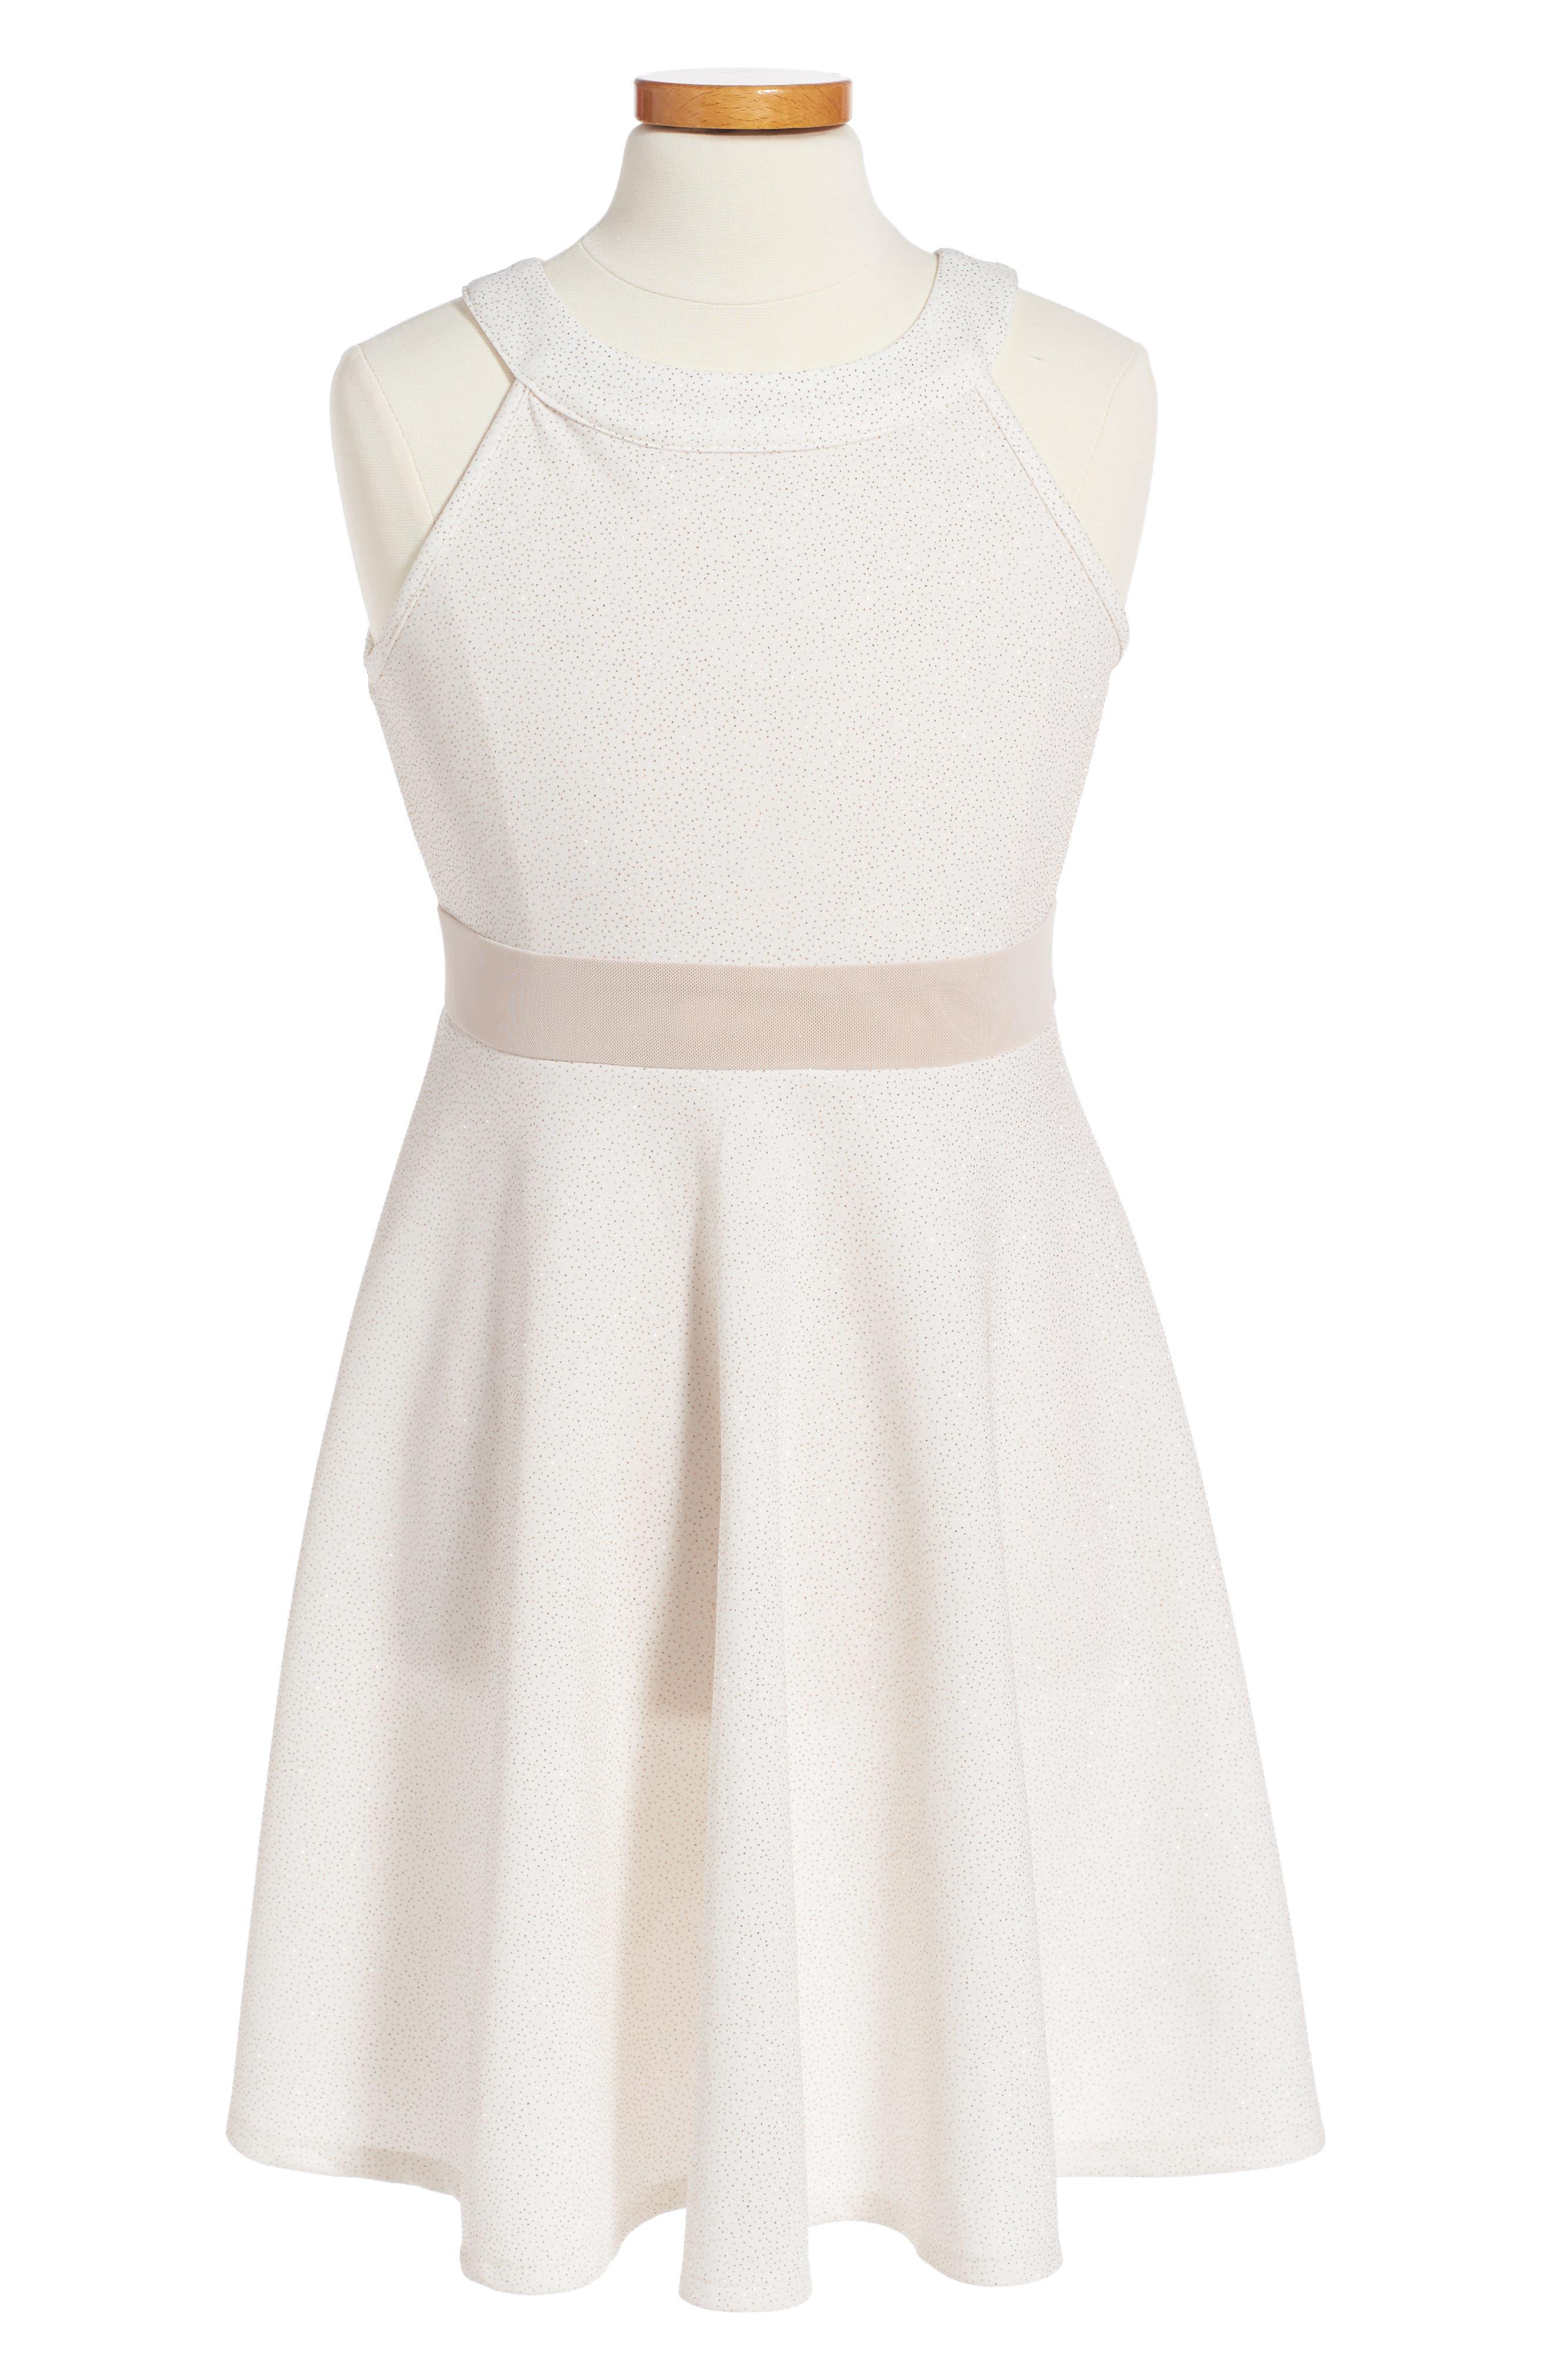 Main Image - Love, Nickie Lew Glitter Scuba Dress (Big Girls)